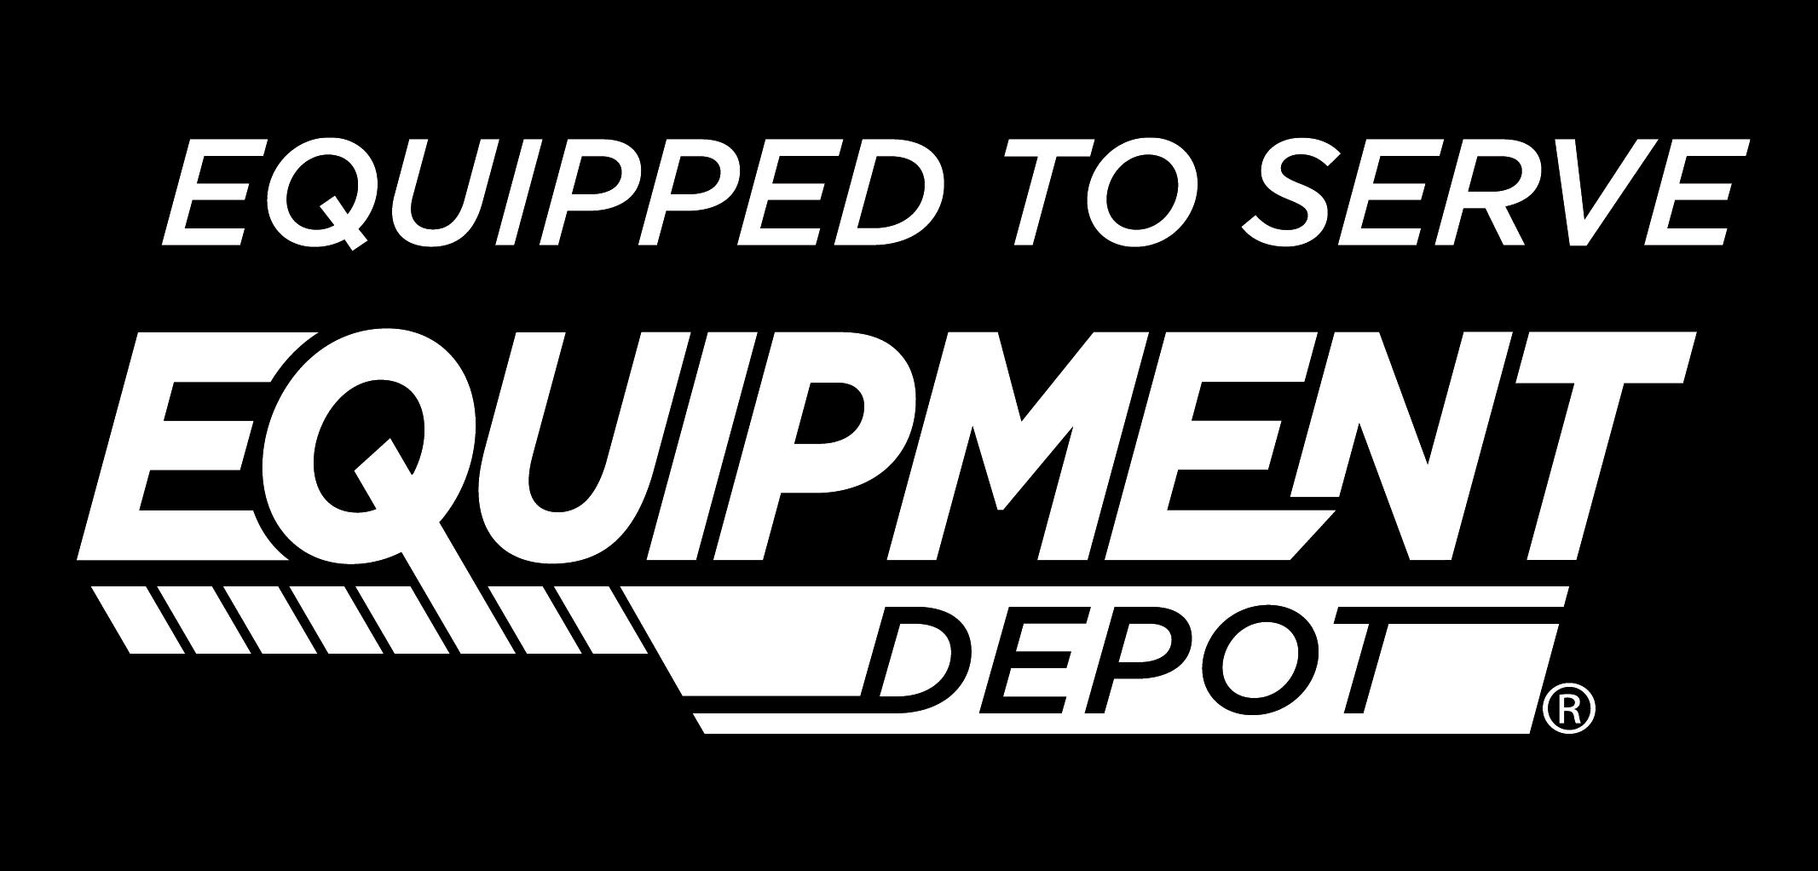 Equipment Depot.jpg